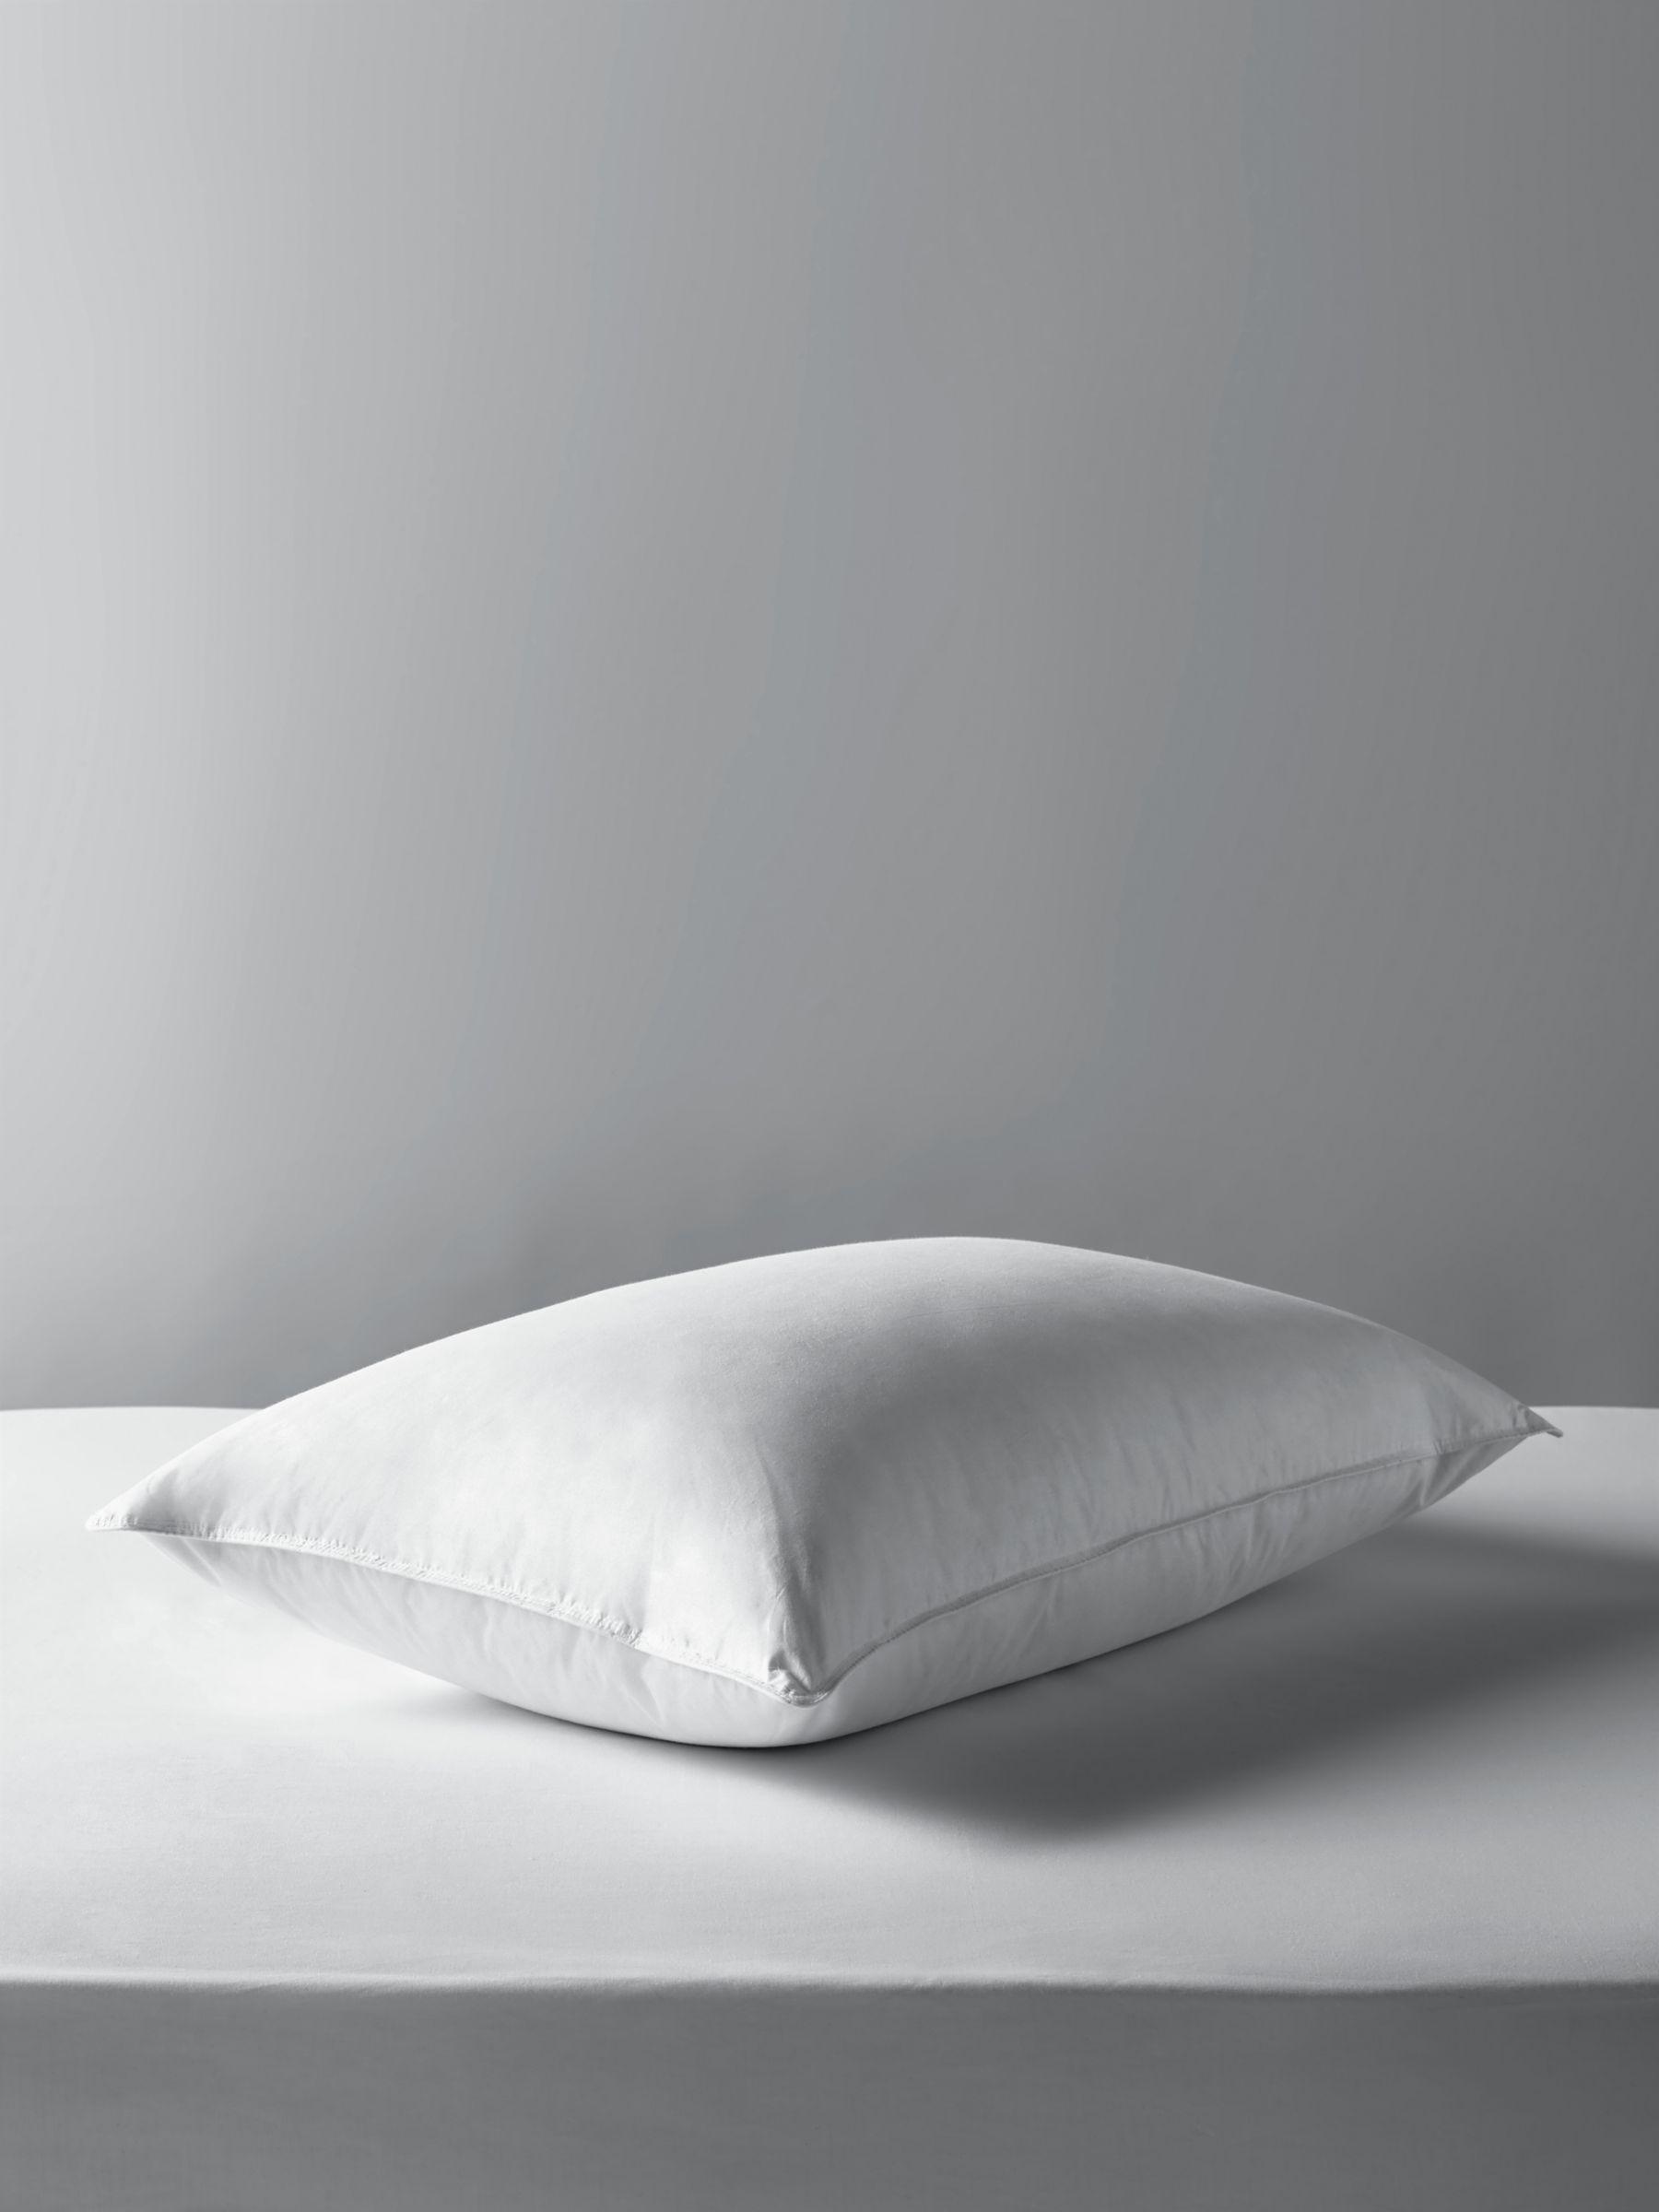 John Lewis & Partners Natural Duck Feather and Down Standard Pillow, Soft/Medium